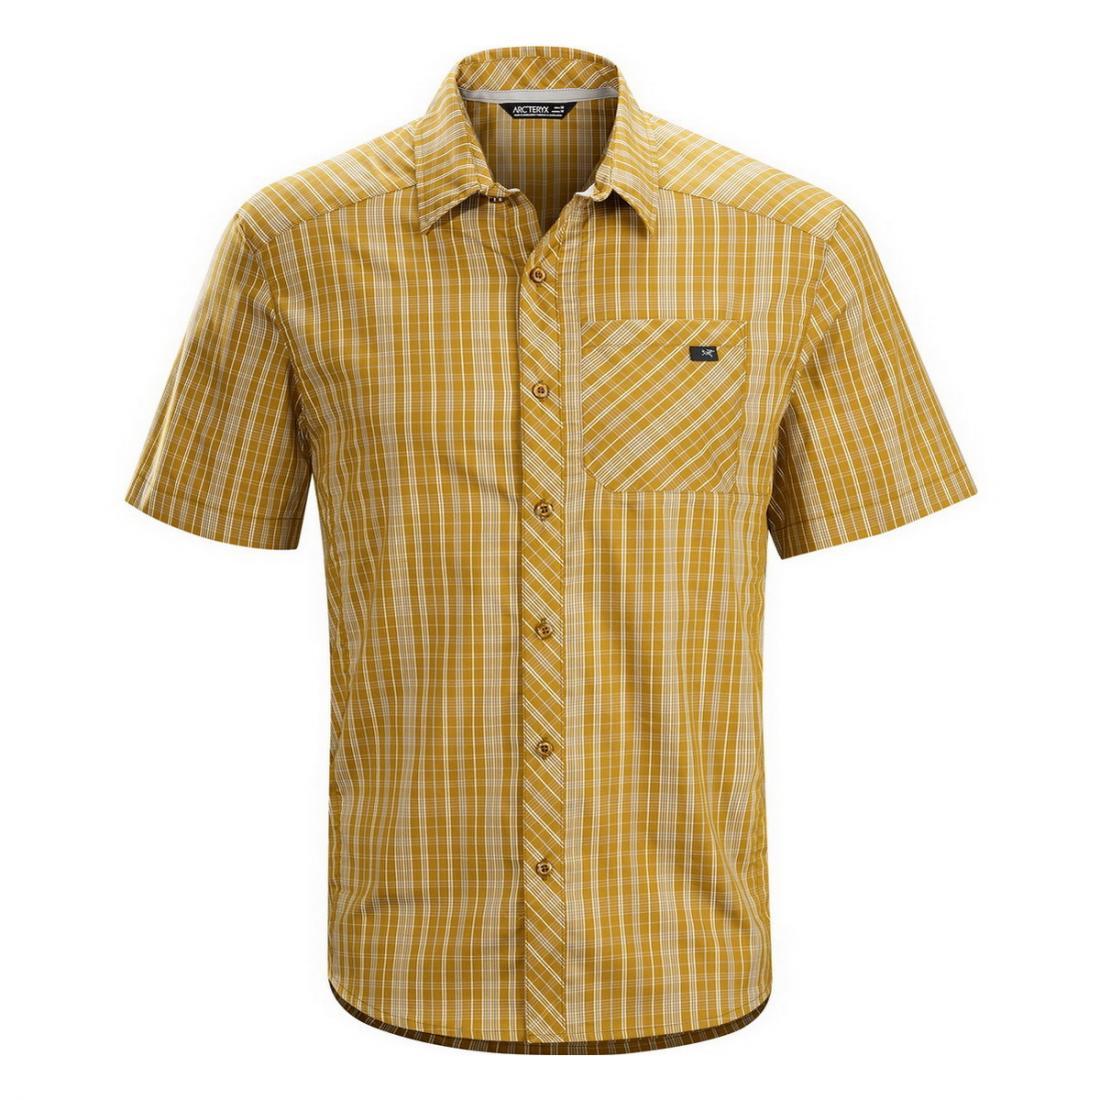 Рубашка Peakline Shirt SS муж.Рубашки<br><br><br>Цвет: Коричневый<br>Размер: M